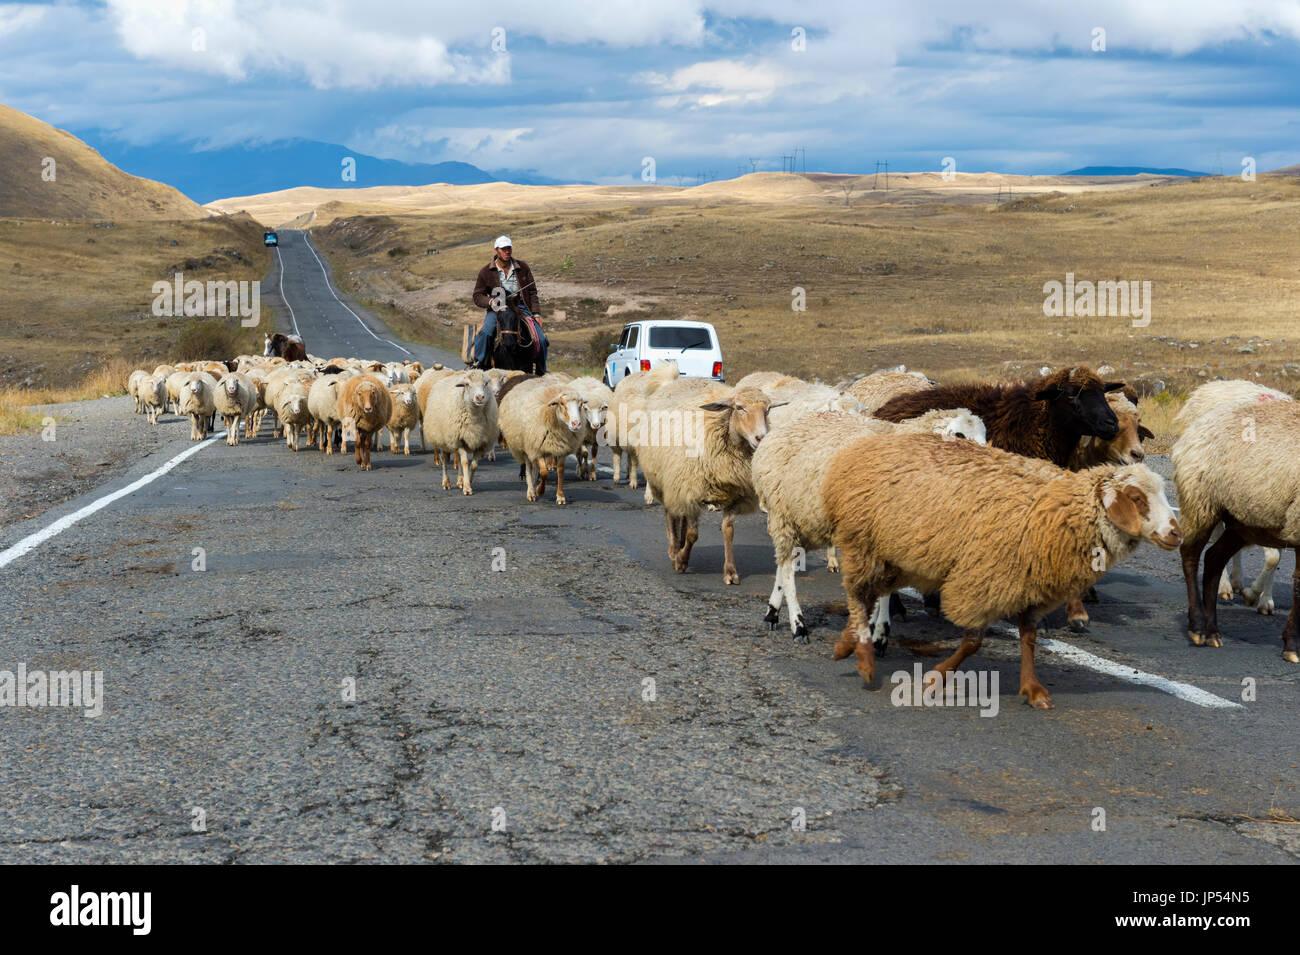 Shephard conducting a group of sheep down a road, Tavush Province, Armenia - Stock Image